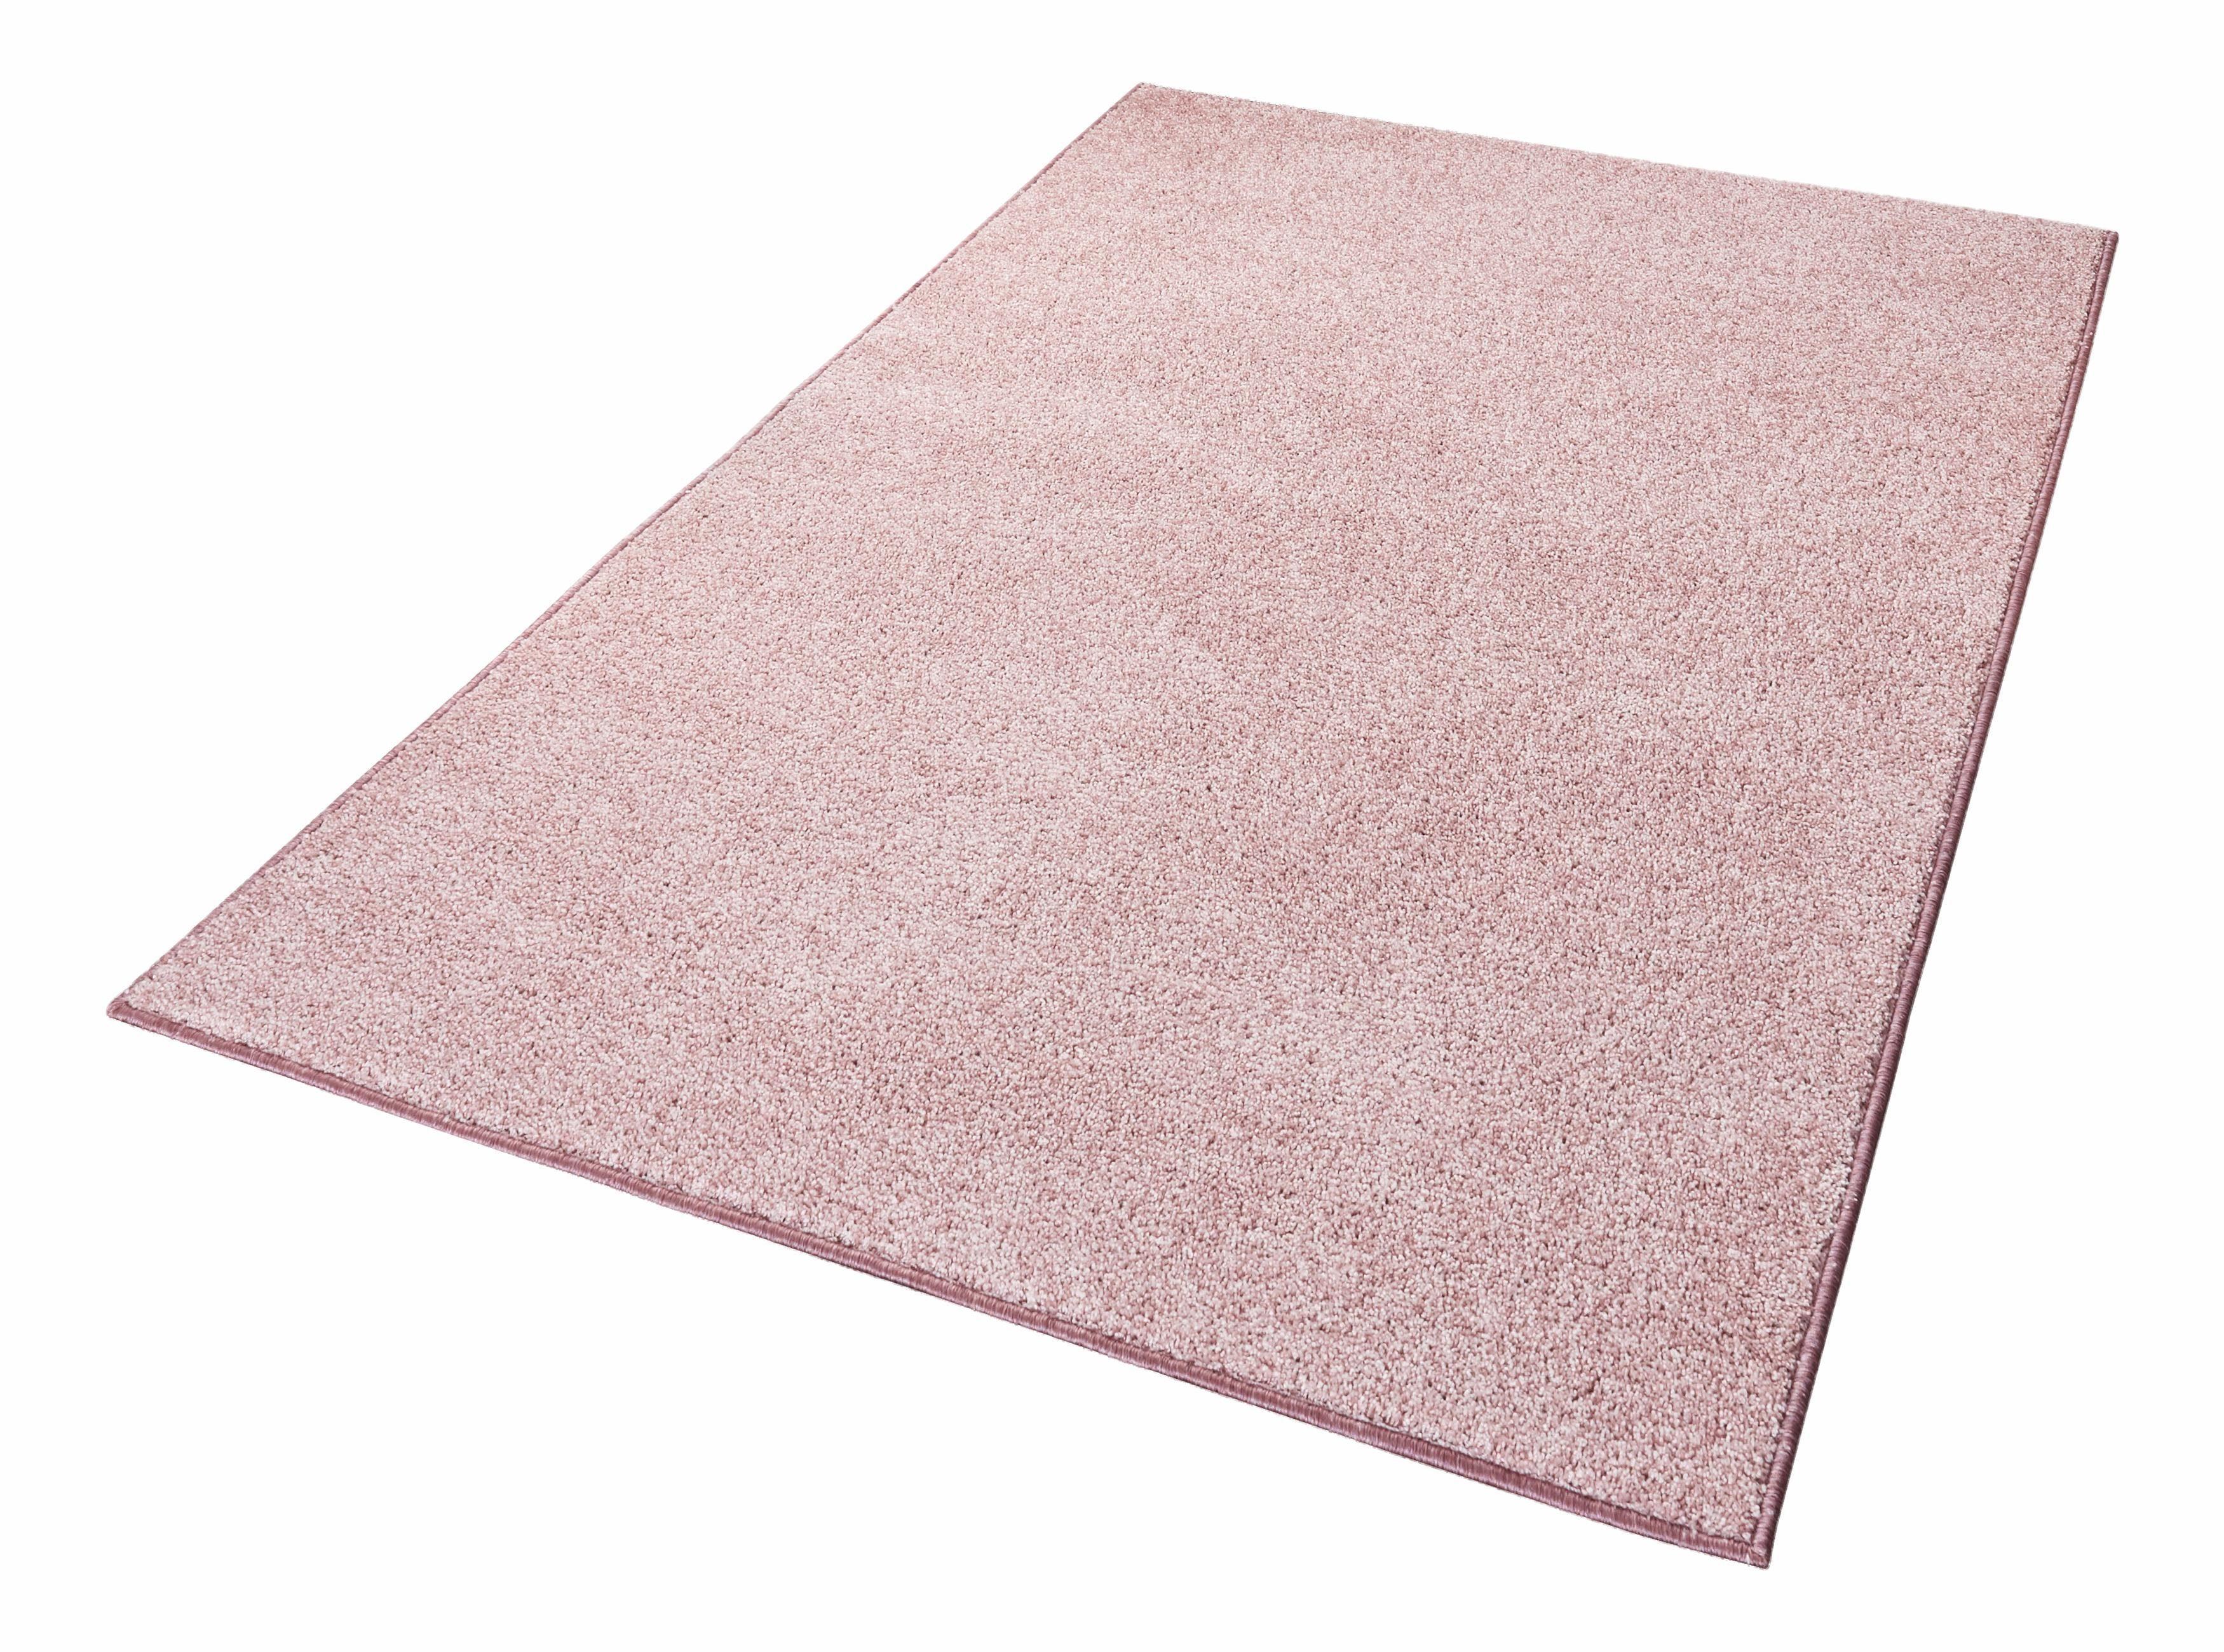 Teppich Fußbodenheizung ~ Fußbodenheizung teppich schön home ideas home idea türen und